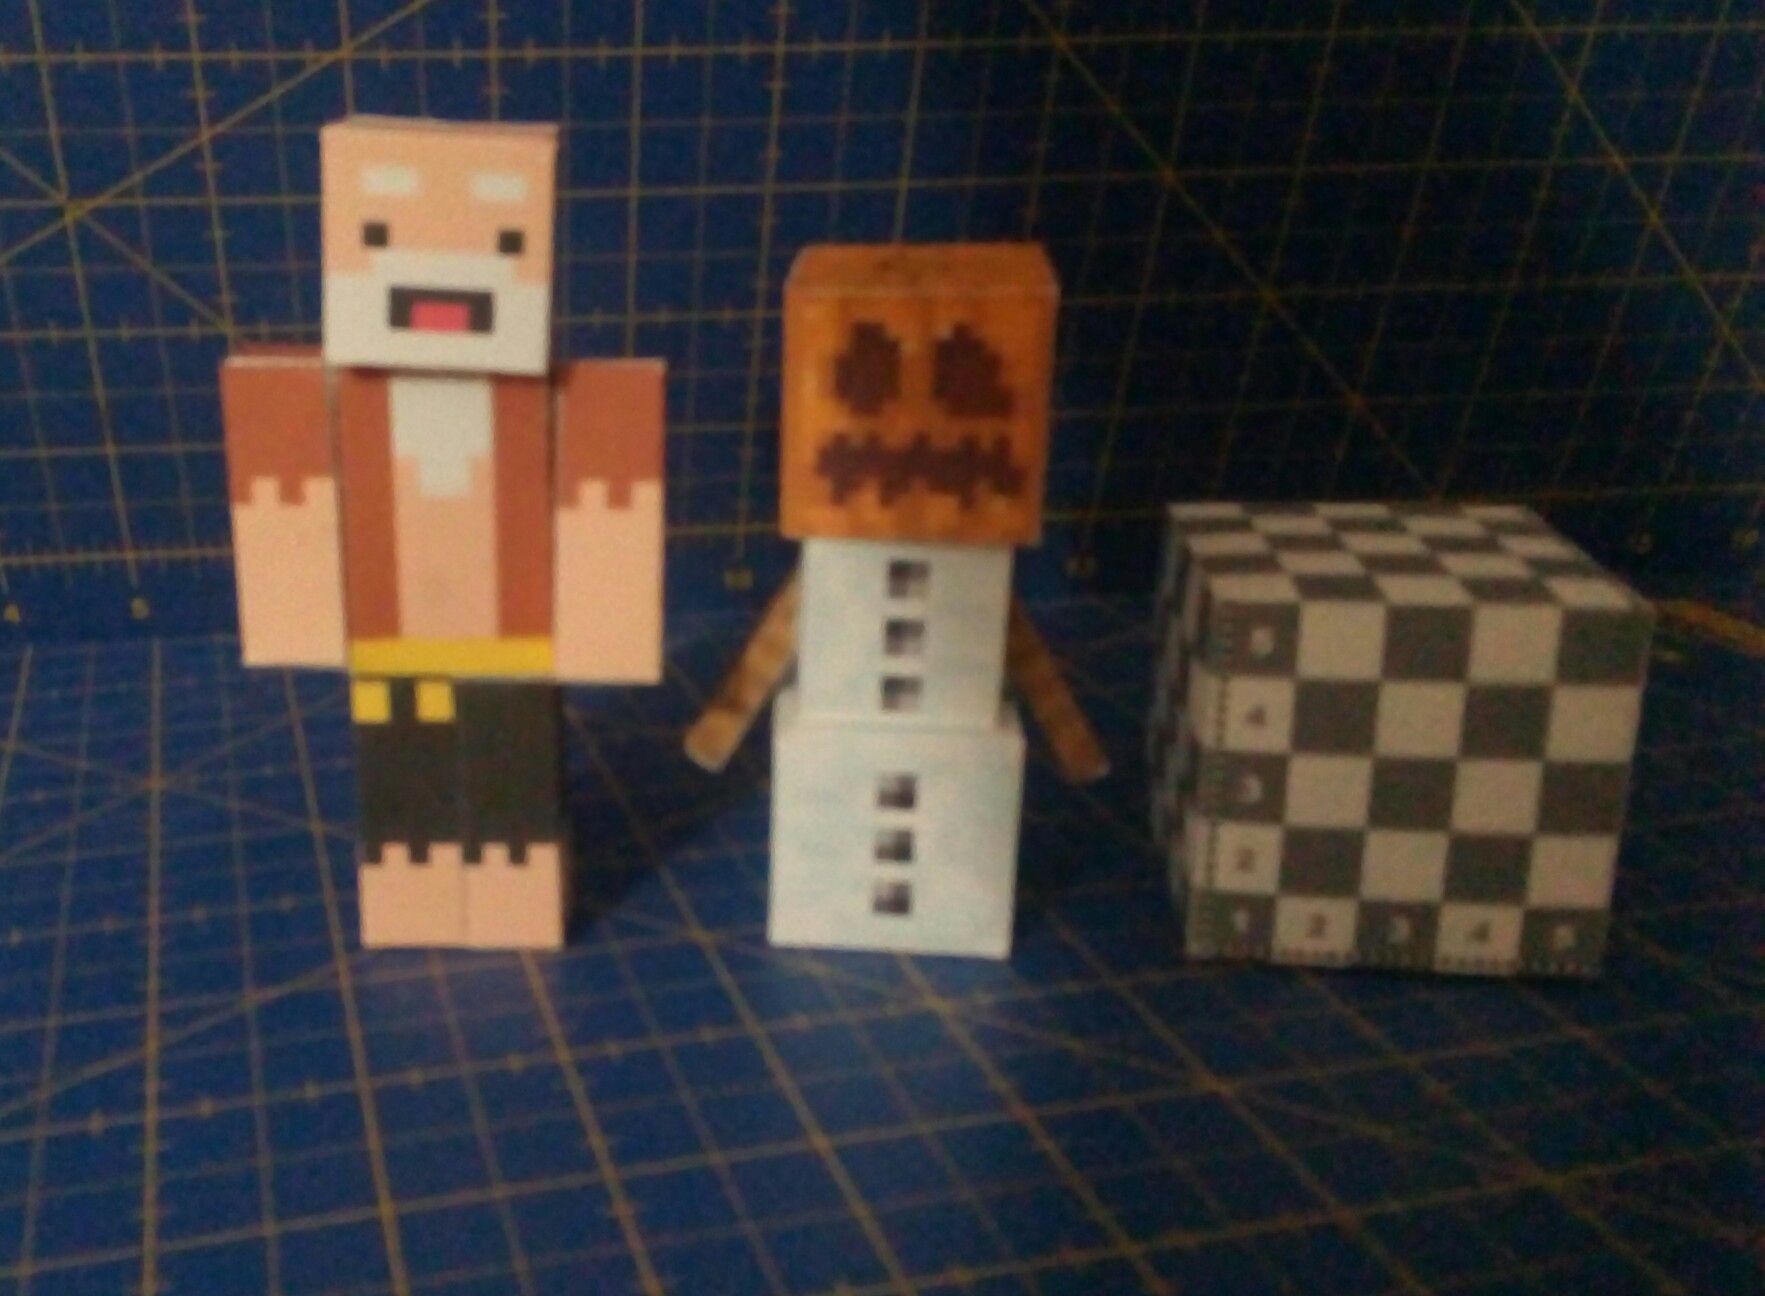 Minecraft Papercraft Shelter Set Pacheco Cara Floja Y yeti Papercraft